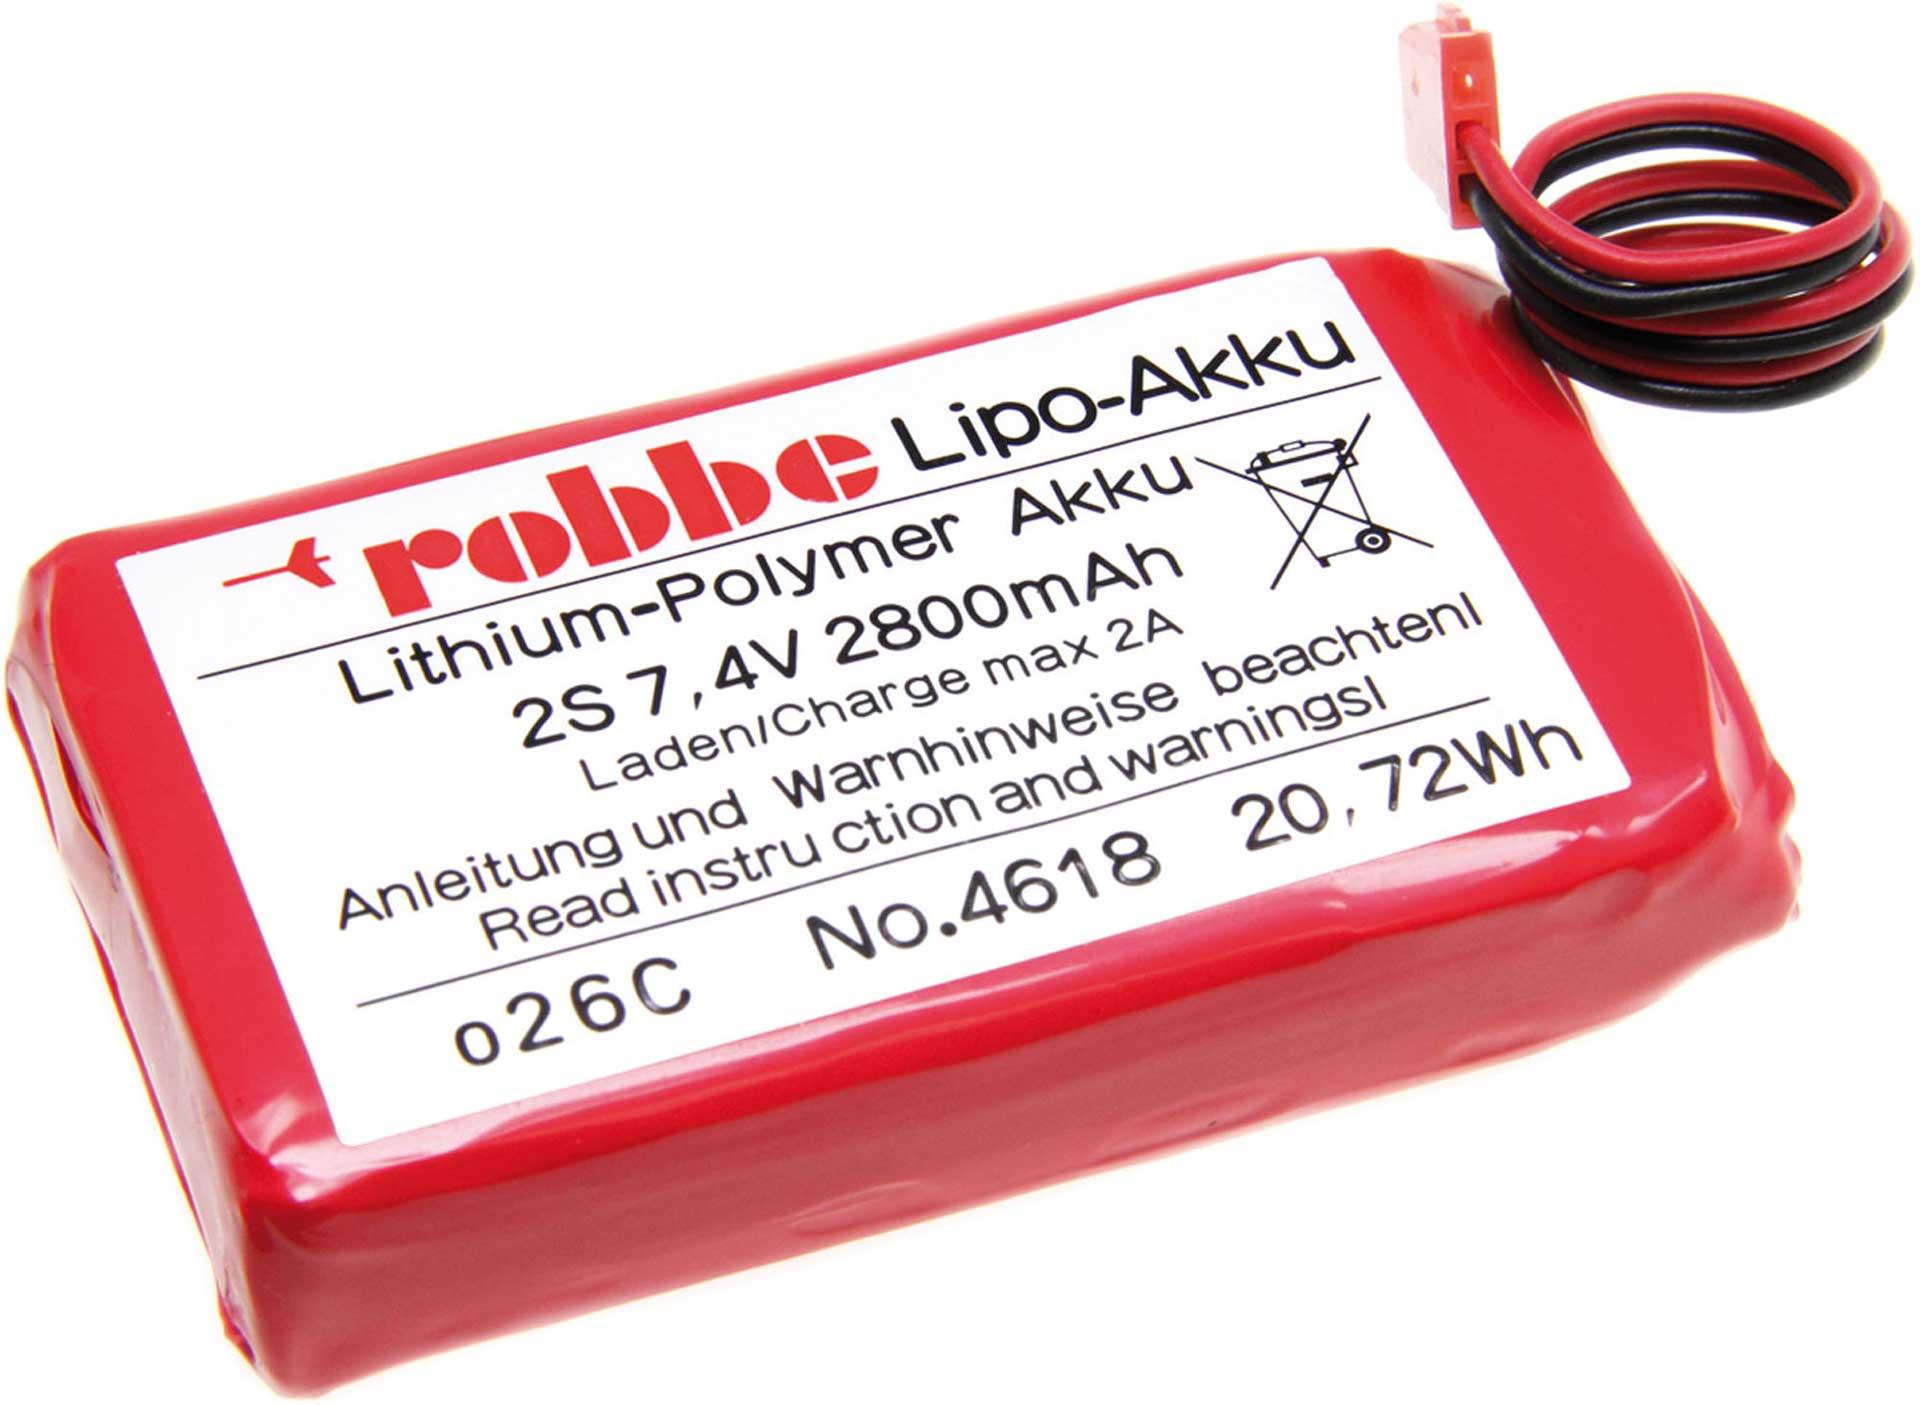 ROBBE LIPO AKKU S-AKKU 7,4 VOLT 2S 2800 MAH